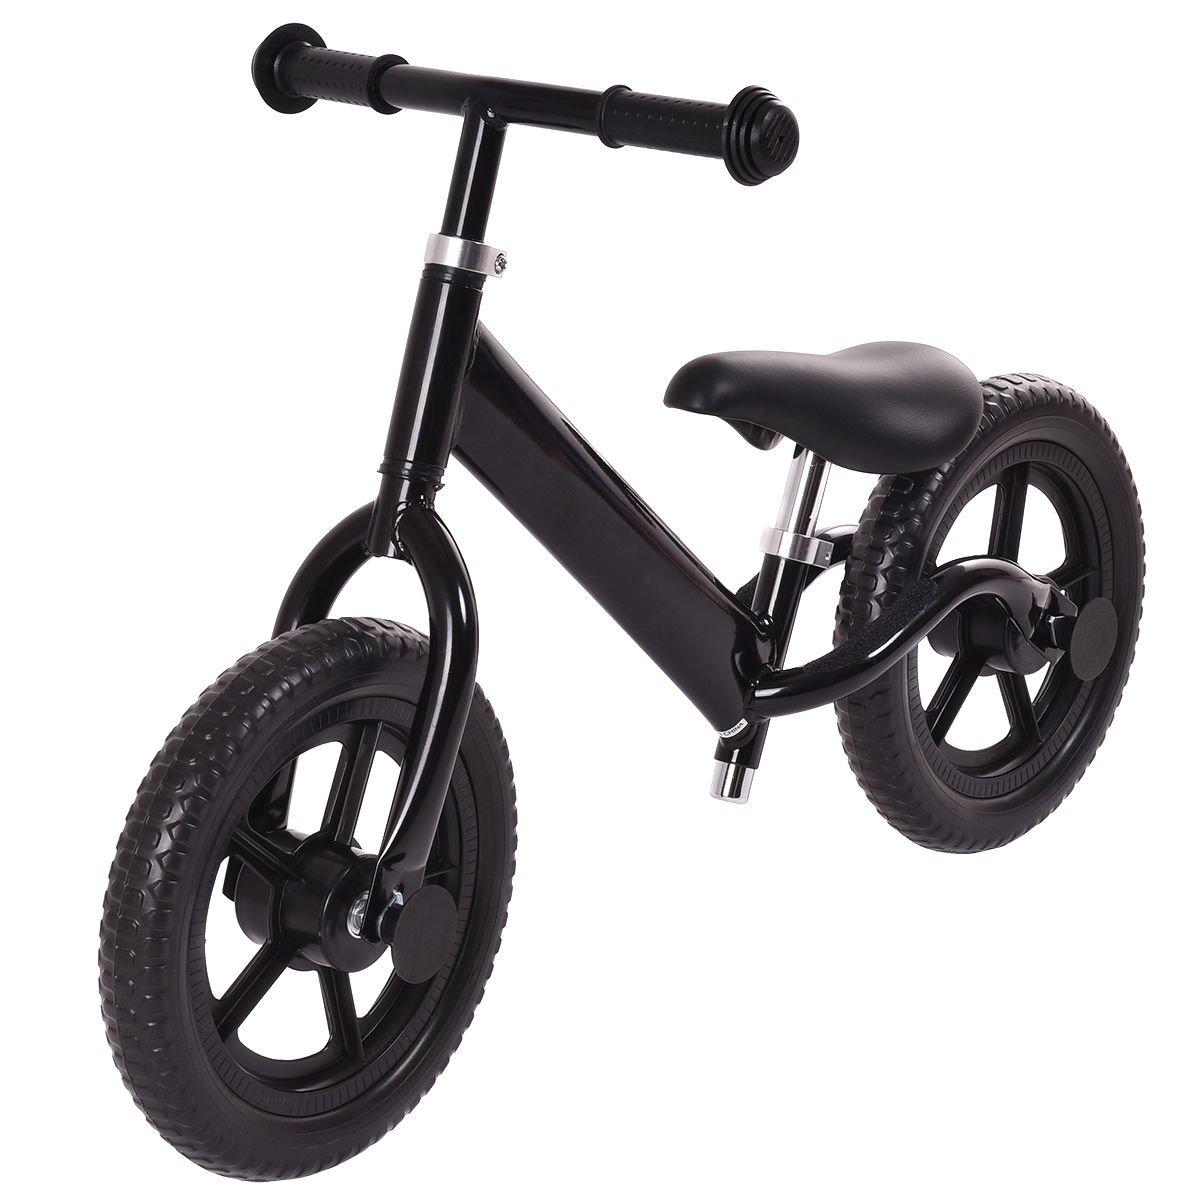 High Bounce Balance Bike Adjustable From 11 16